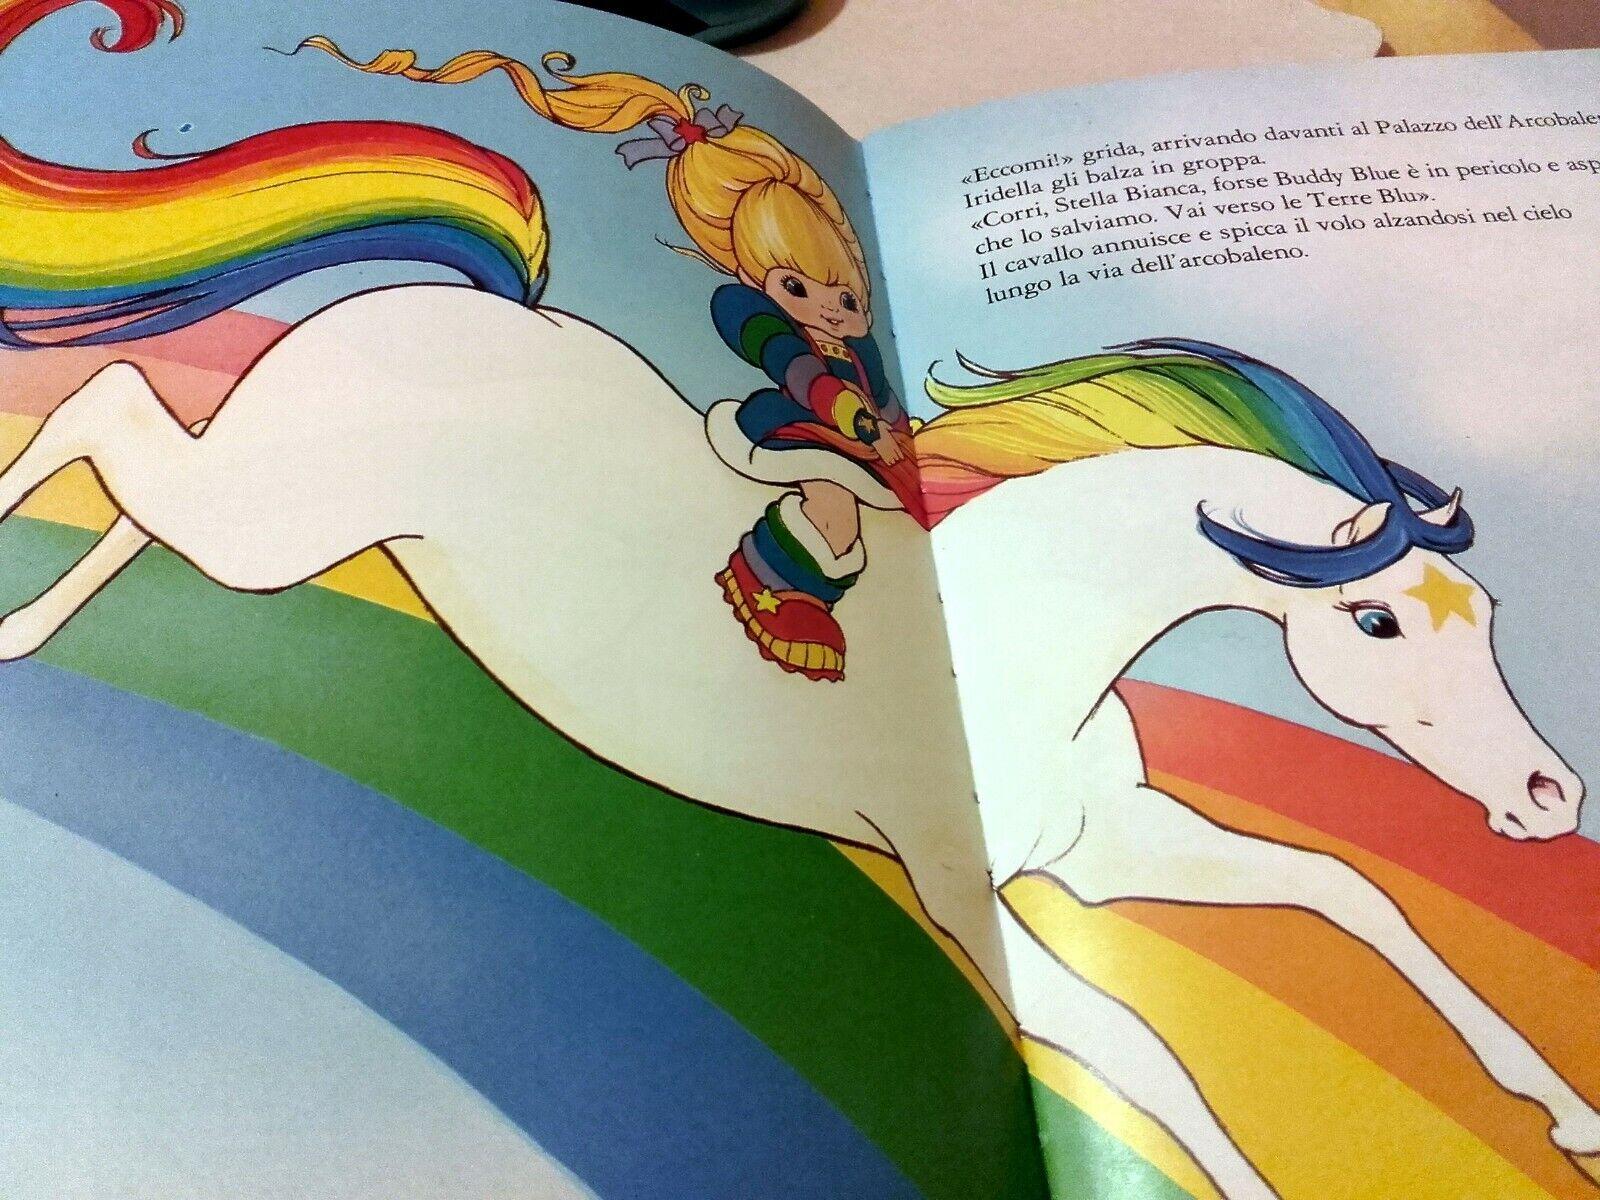 Iridella -Rainbow -Rainbow -Rainbow Brite-libro AMZ - anni '80 NUOVO a80283